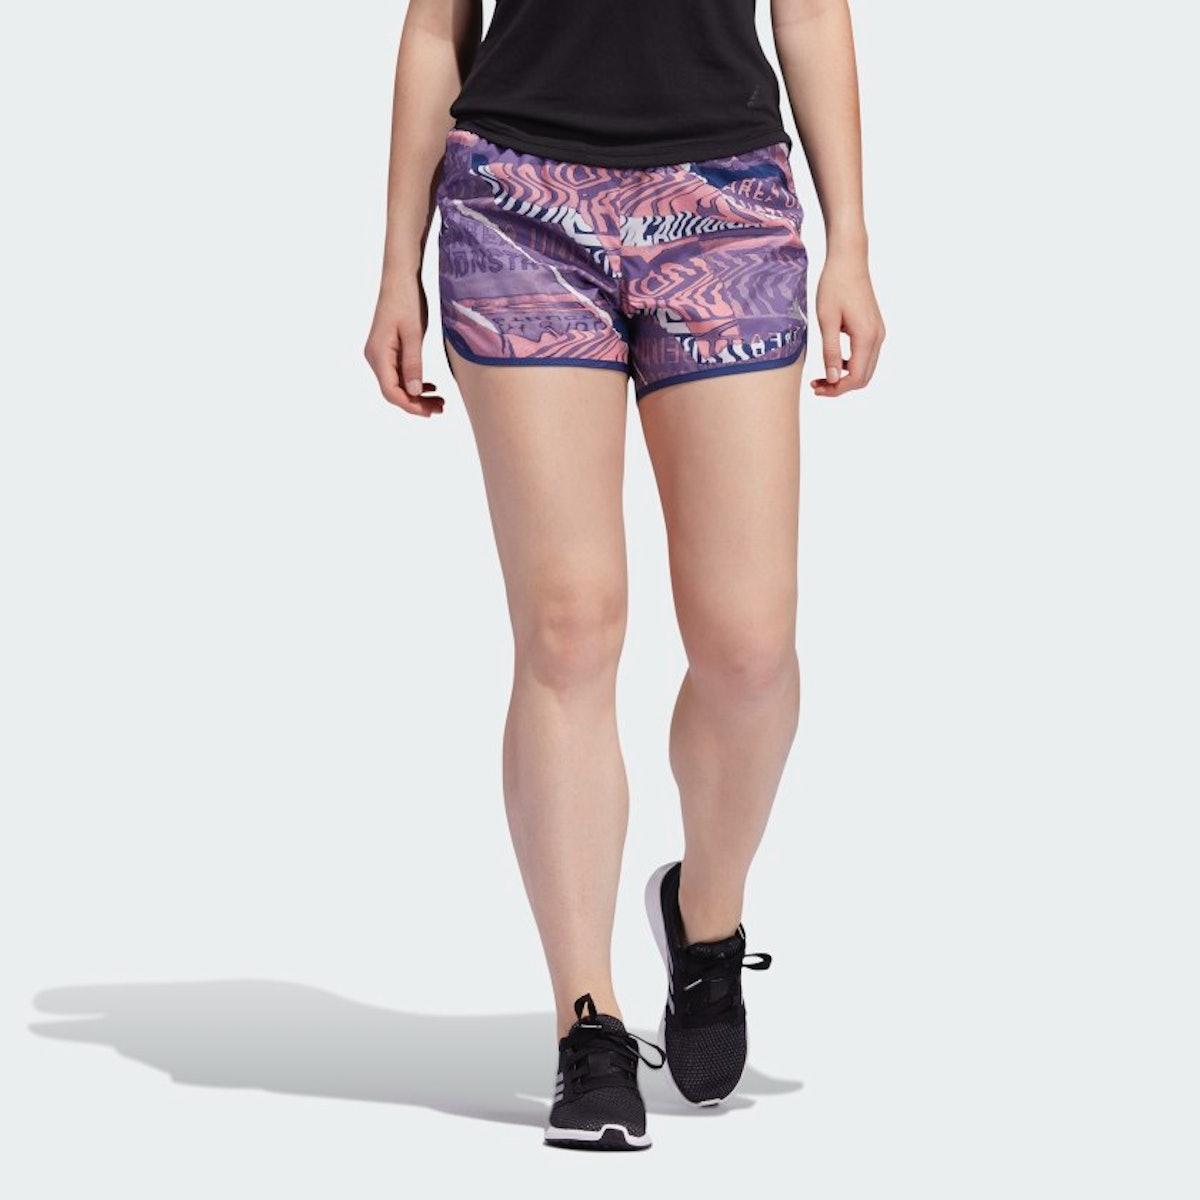 Adidas Marathon 20 City Clash Shorts